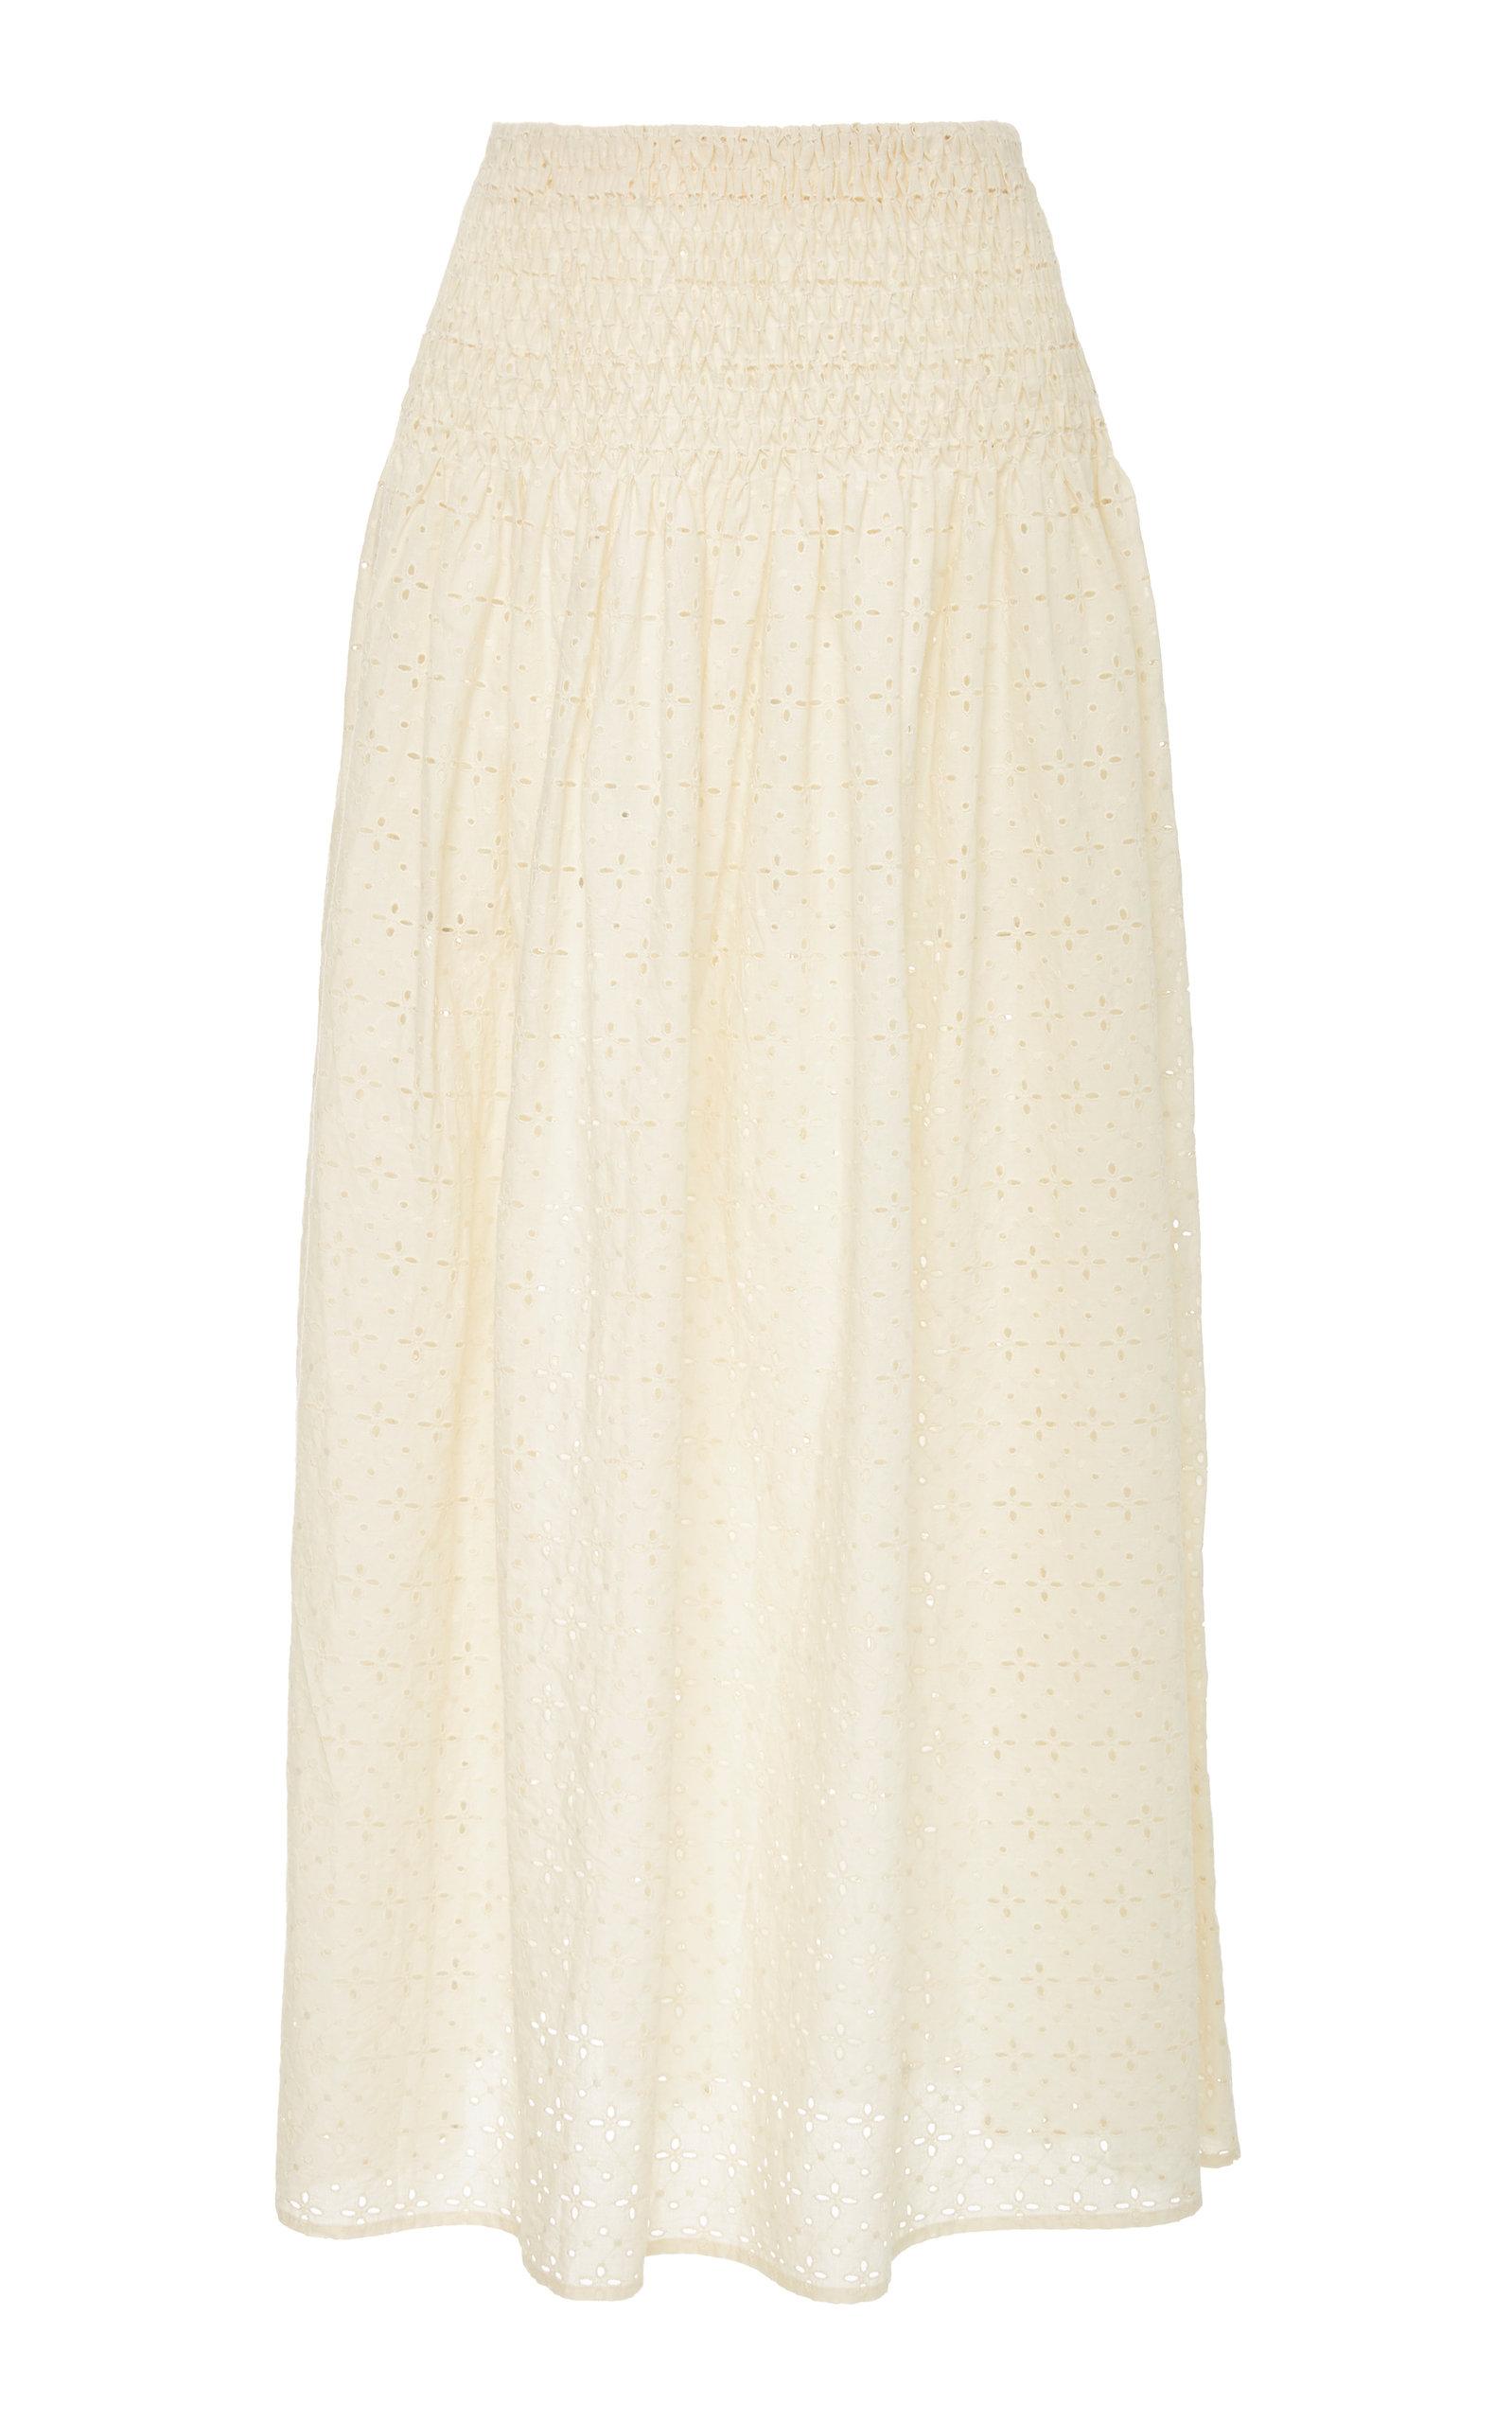 MARYSIA Abacos Midi Skirt in Neutrals